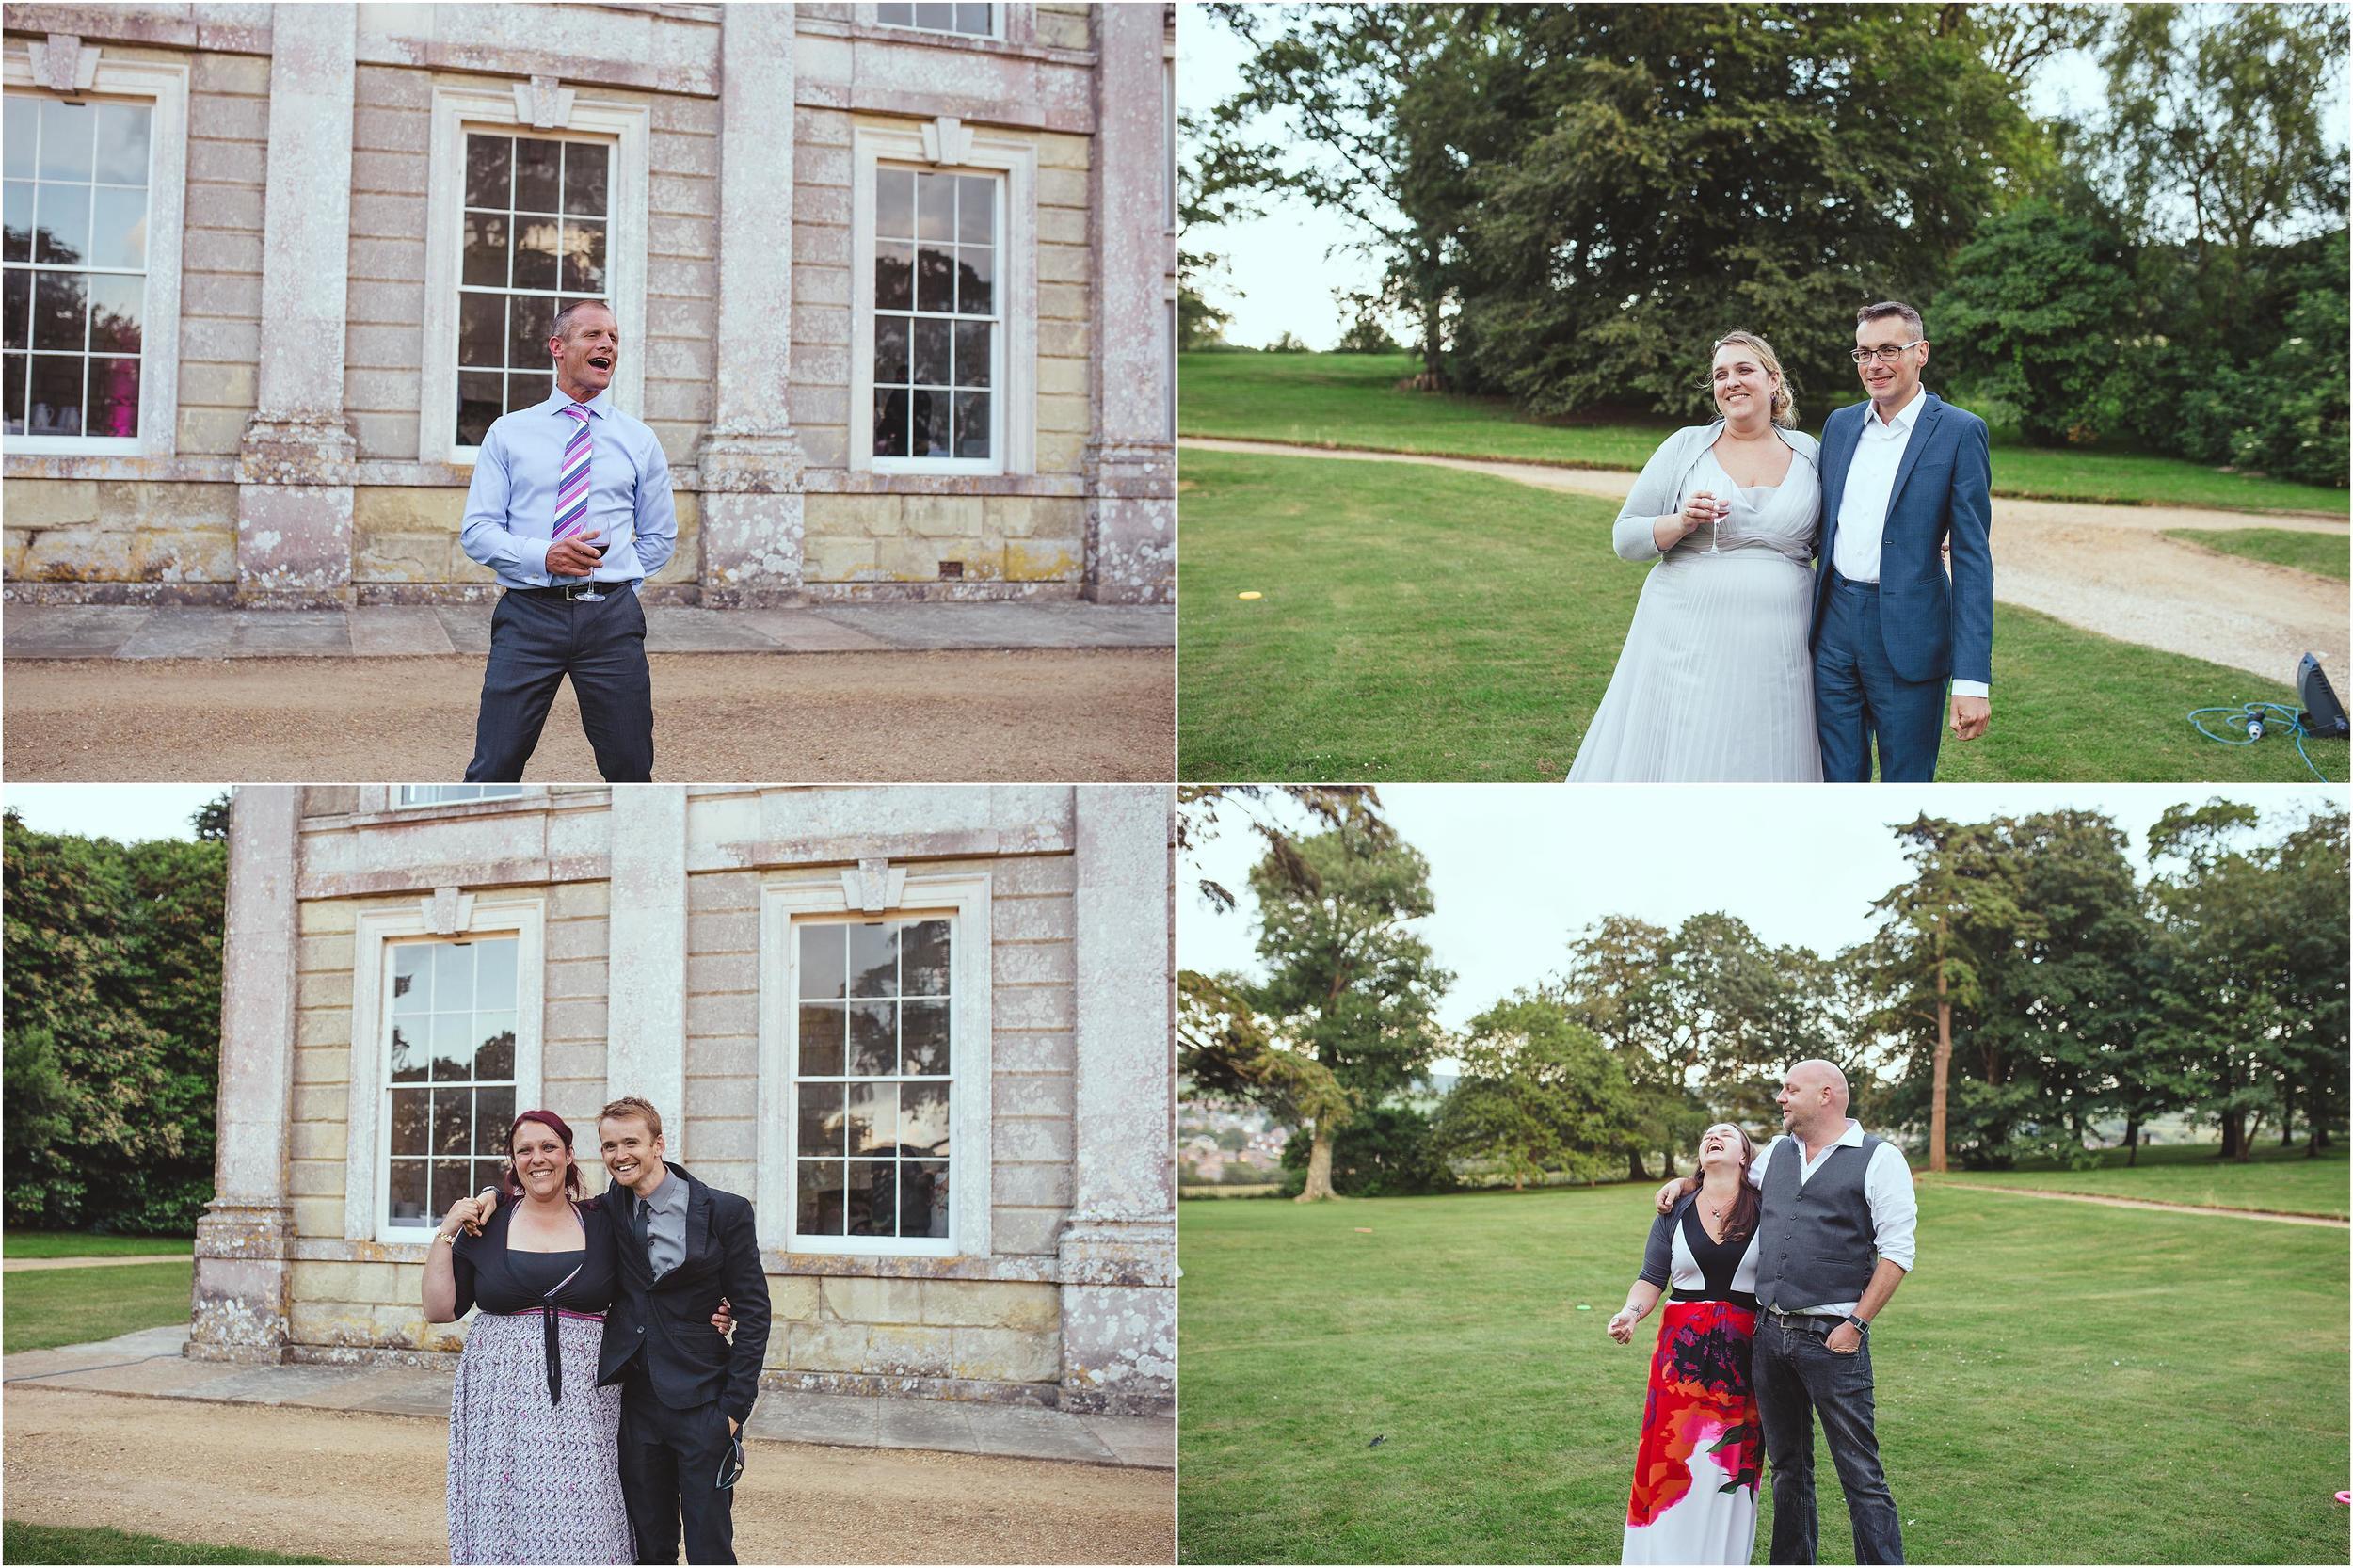 Appuldurcombe house wedding_0061.jpg